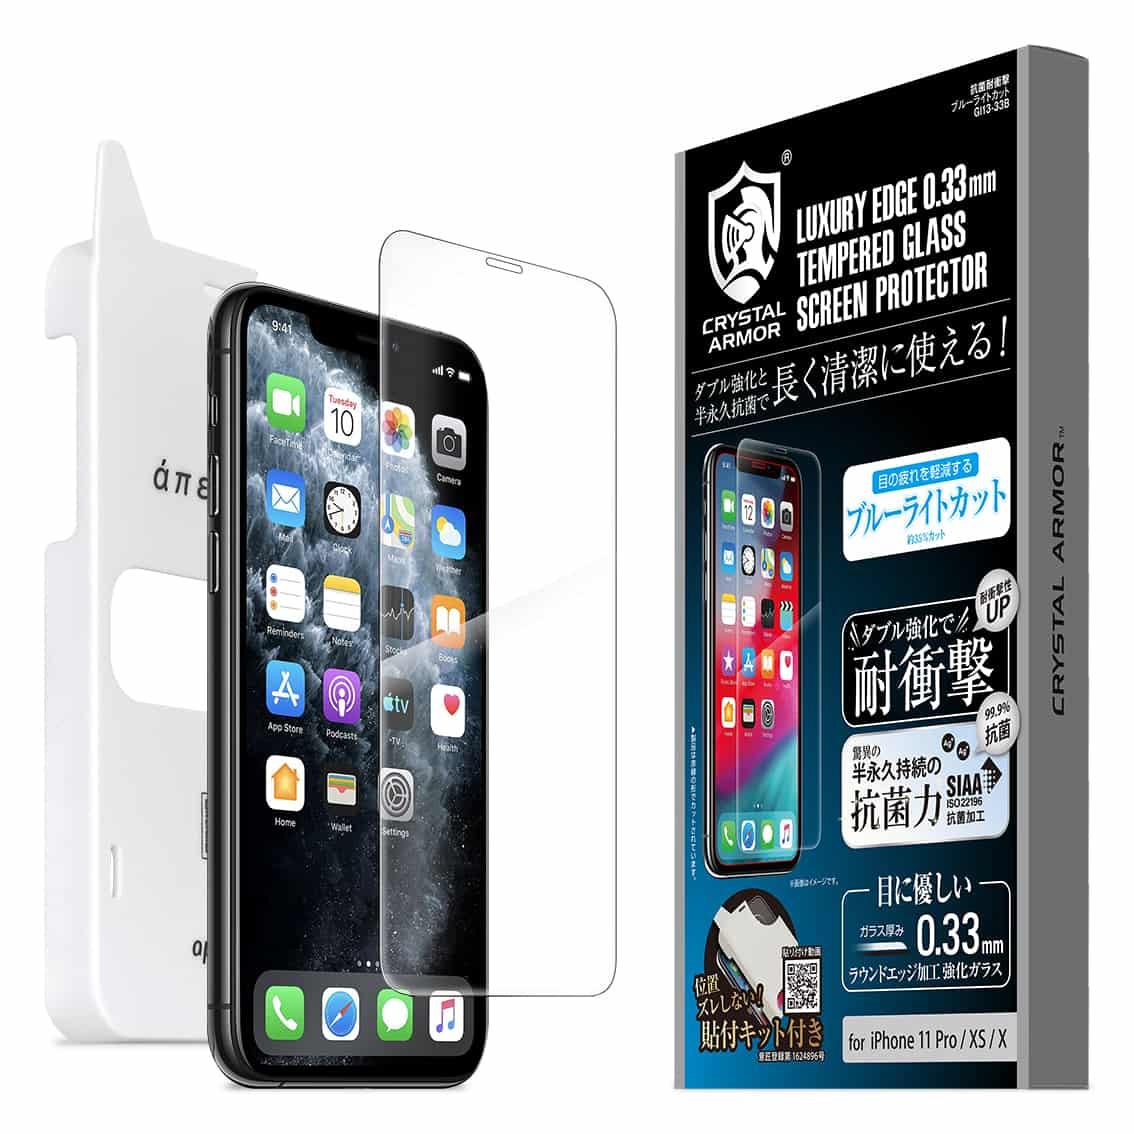 iPhone 11Pro / XS / X 強化ガラス 液晶保護 抗菌 耐衝撃 ブルーライトカット 0.33mm